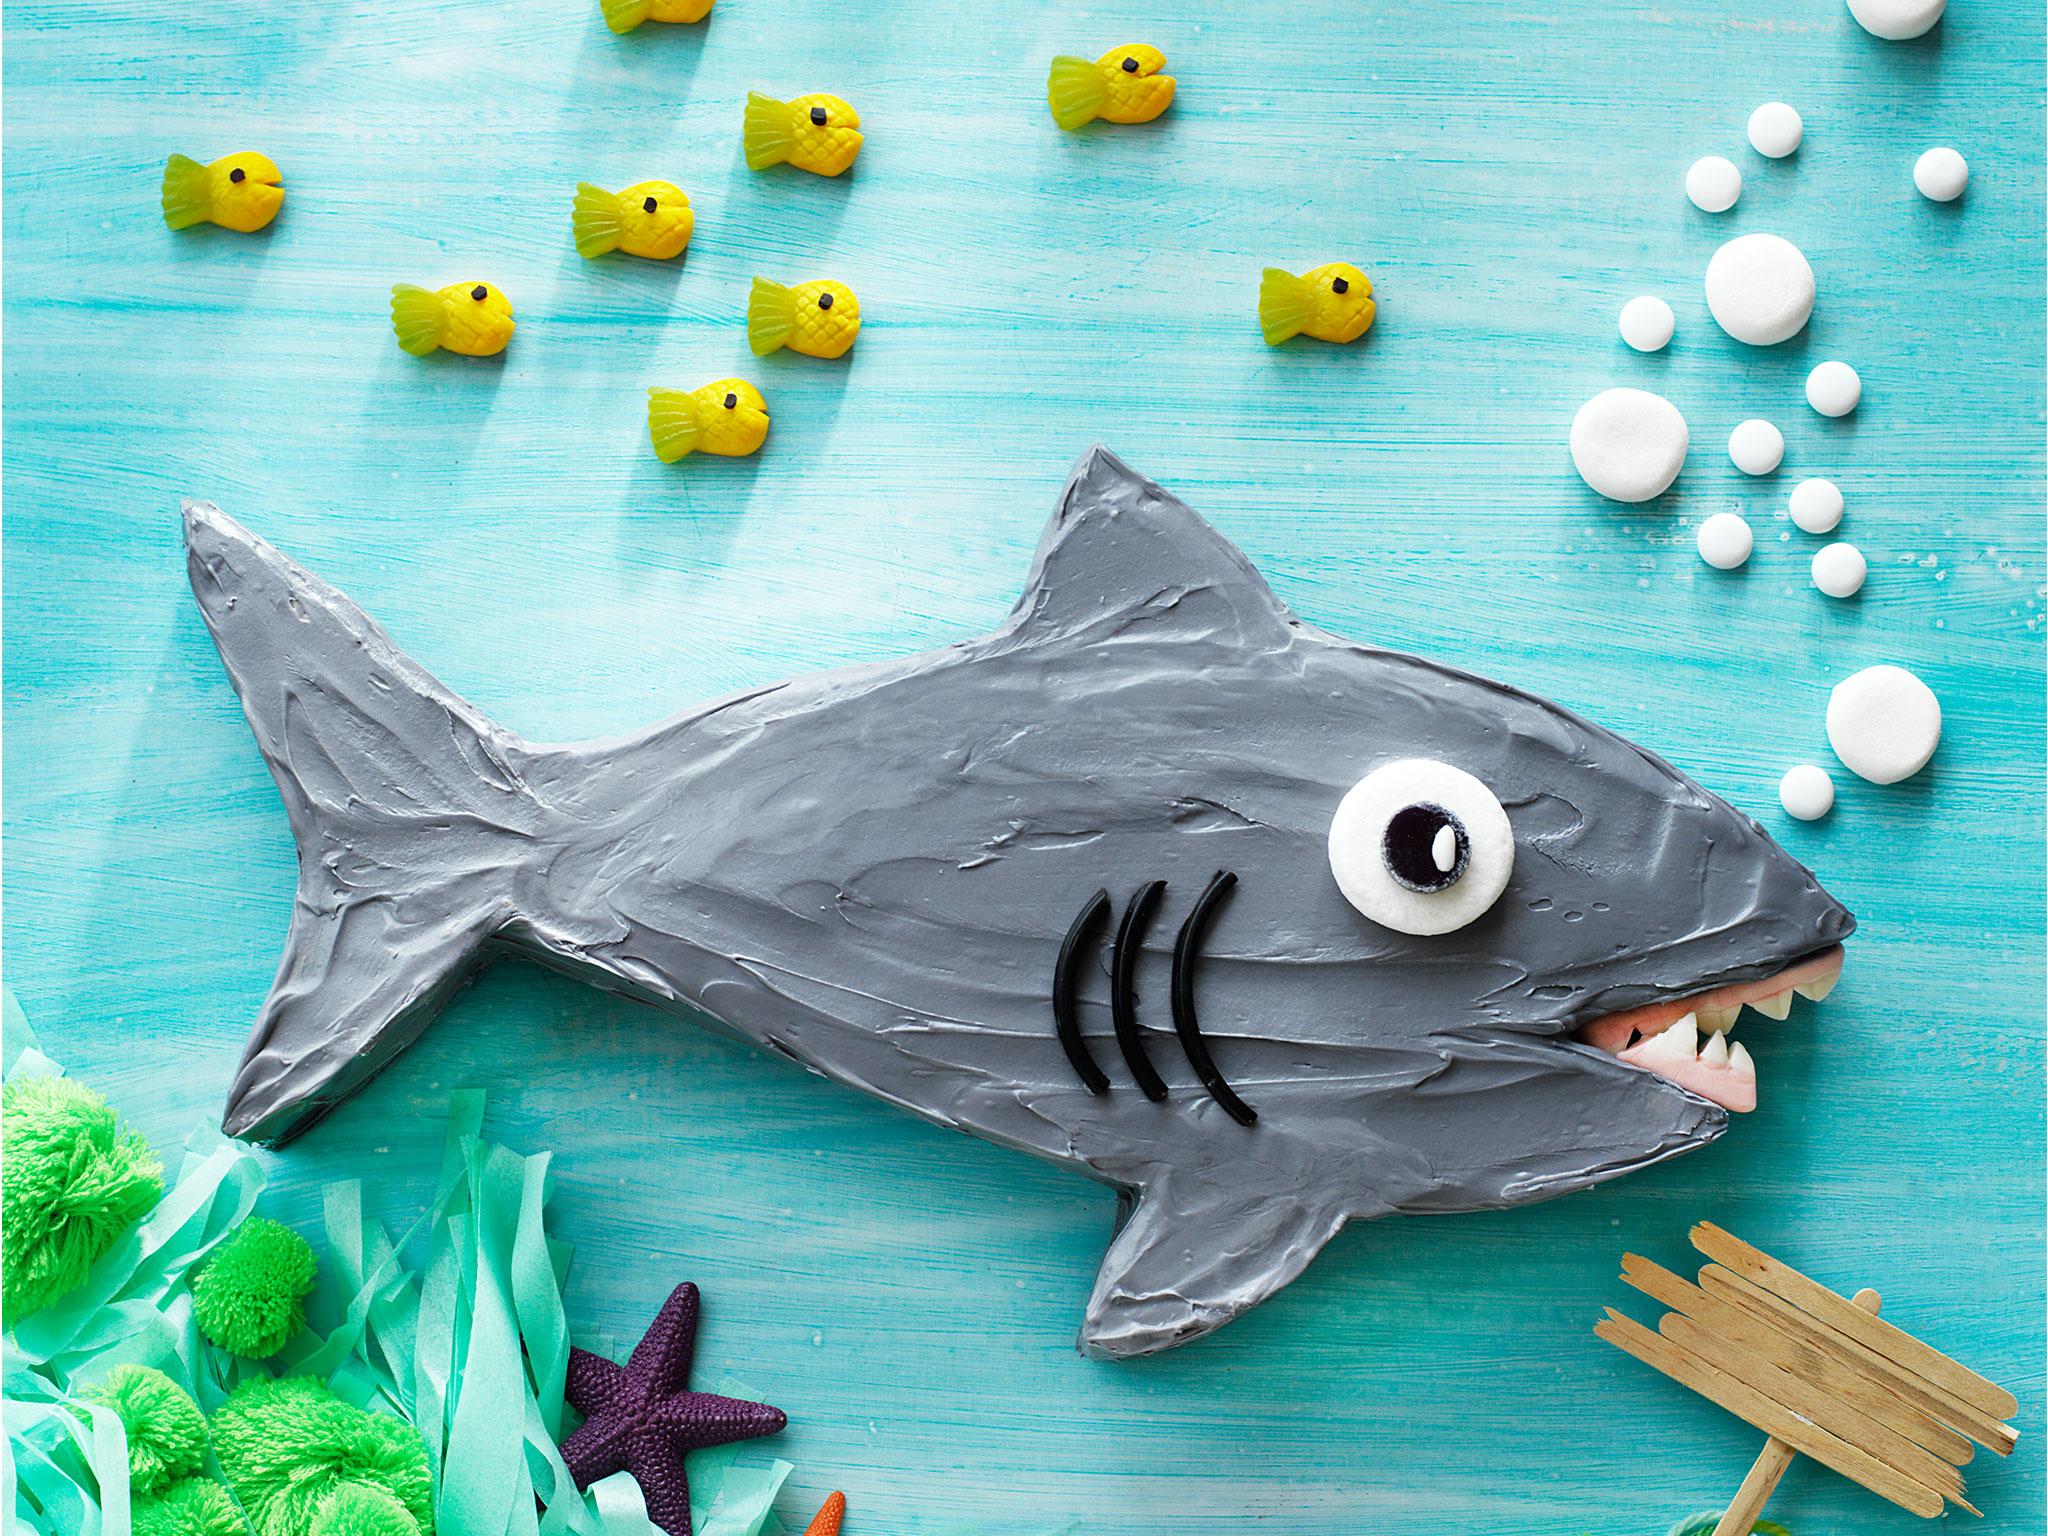 Sammy the shark cake recipe | Food To Love